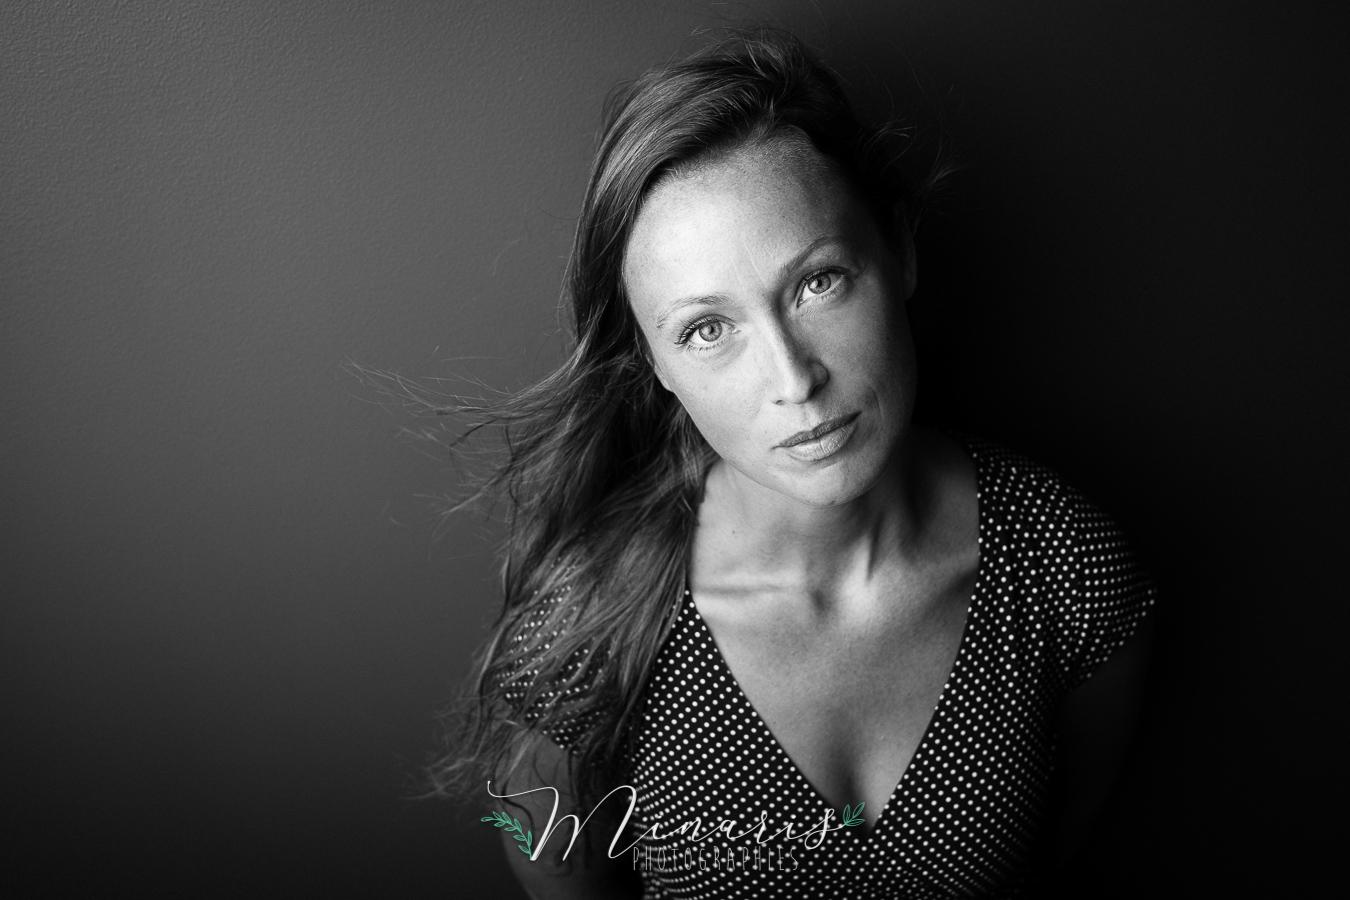 Shooting studio femme